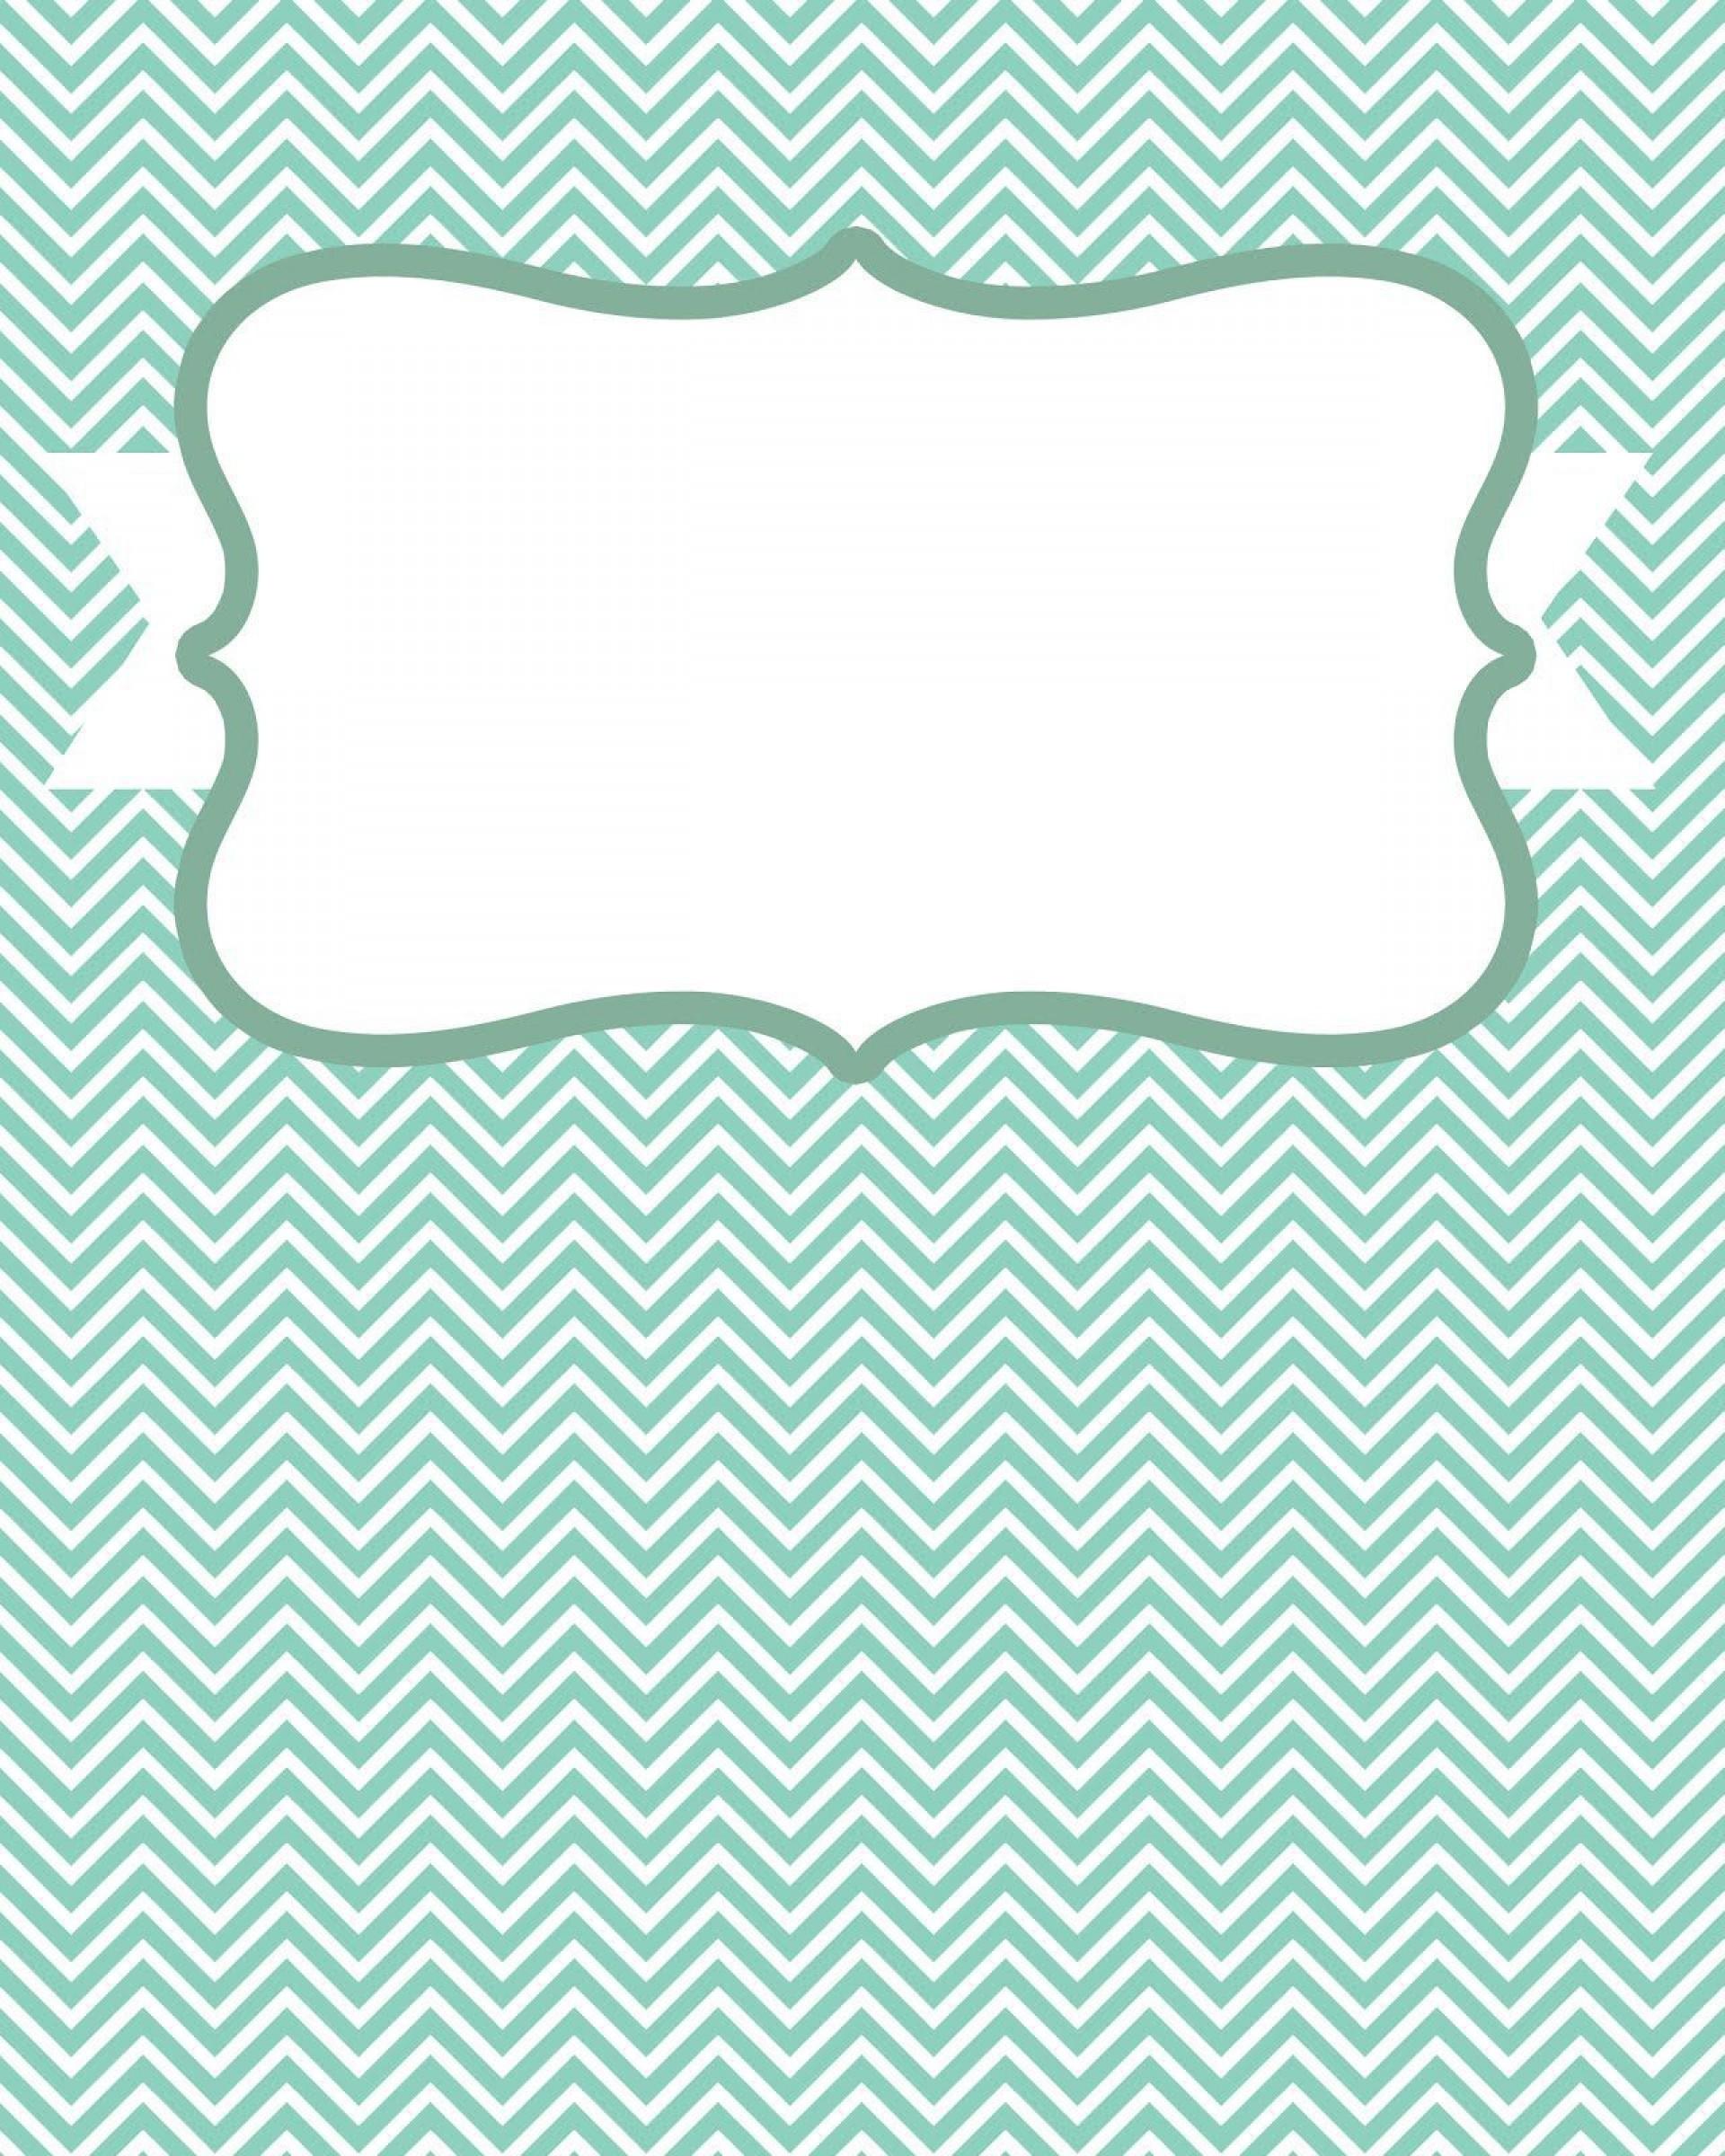 007 Beautiful Cute Binder Cover Template Free Printable Design 1920